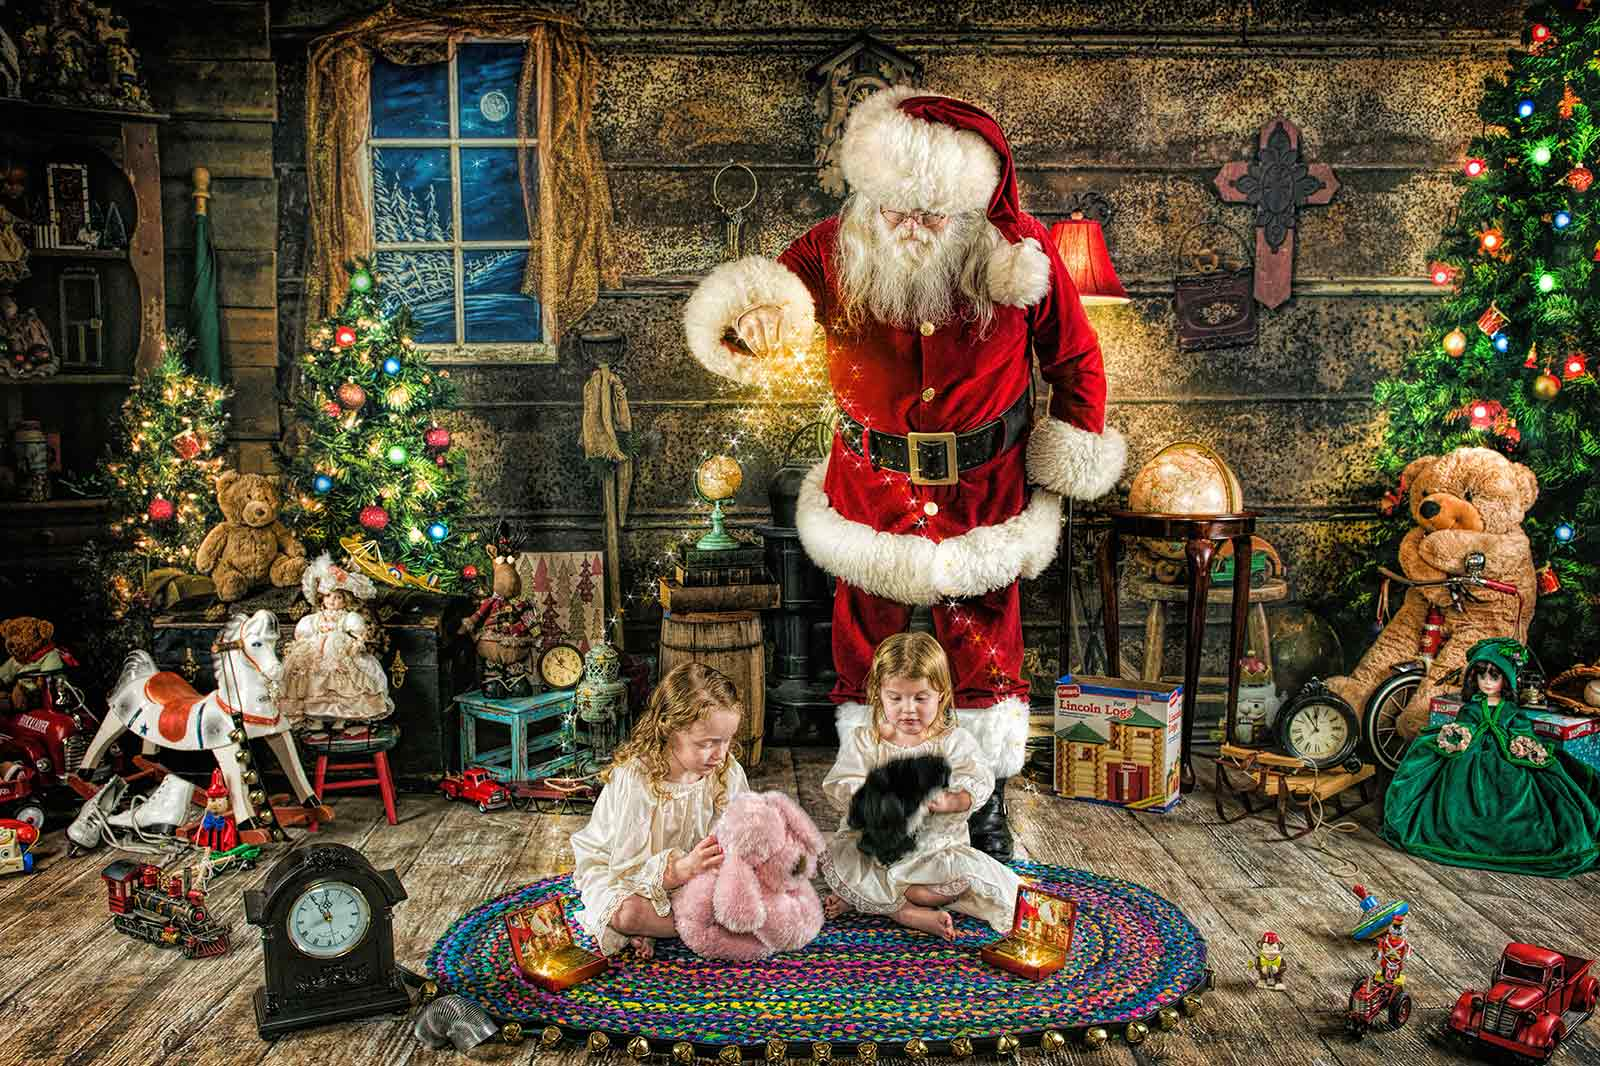 011_Magic-of-Santa-Anna-Thielen-Photography